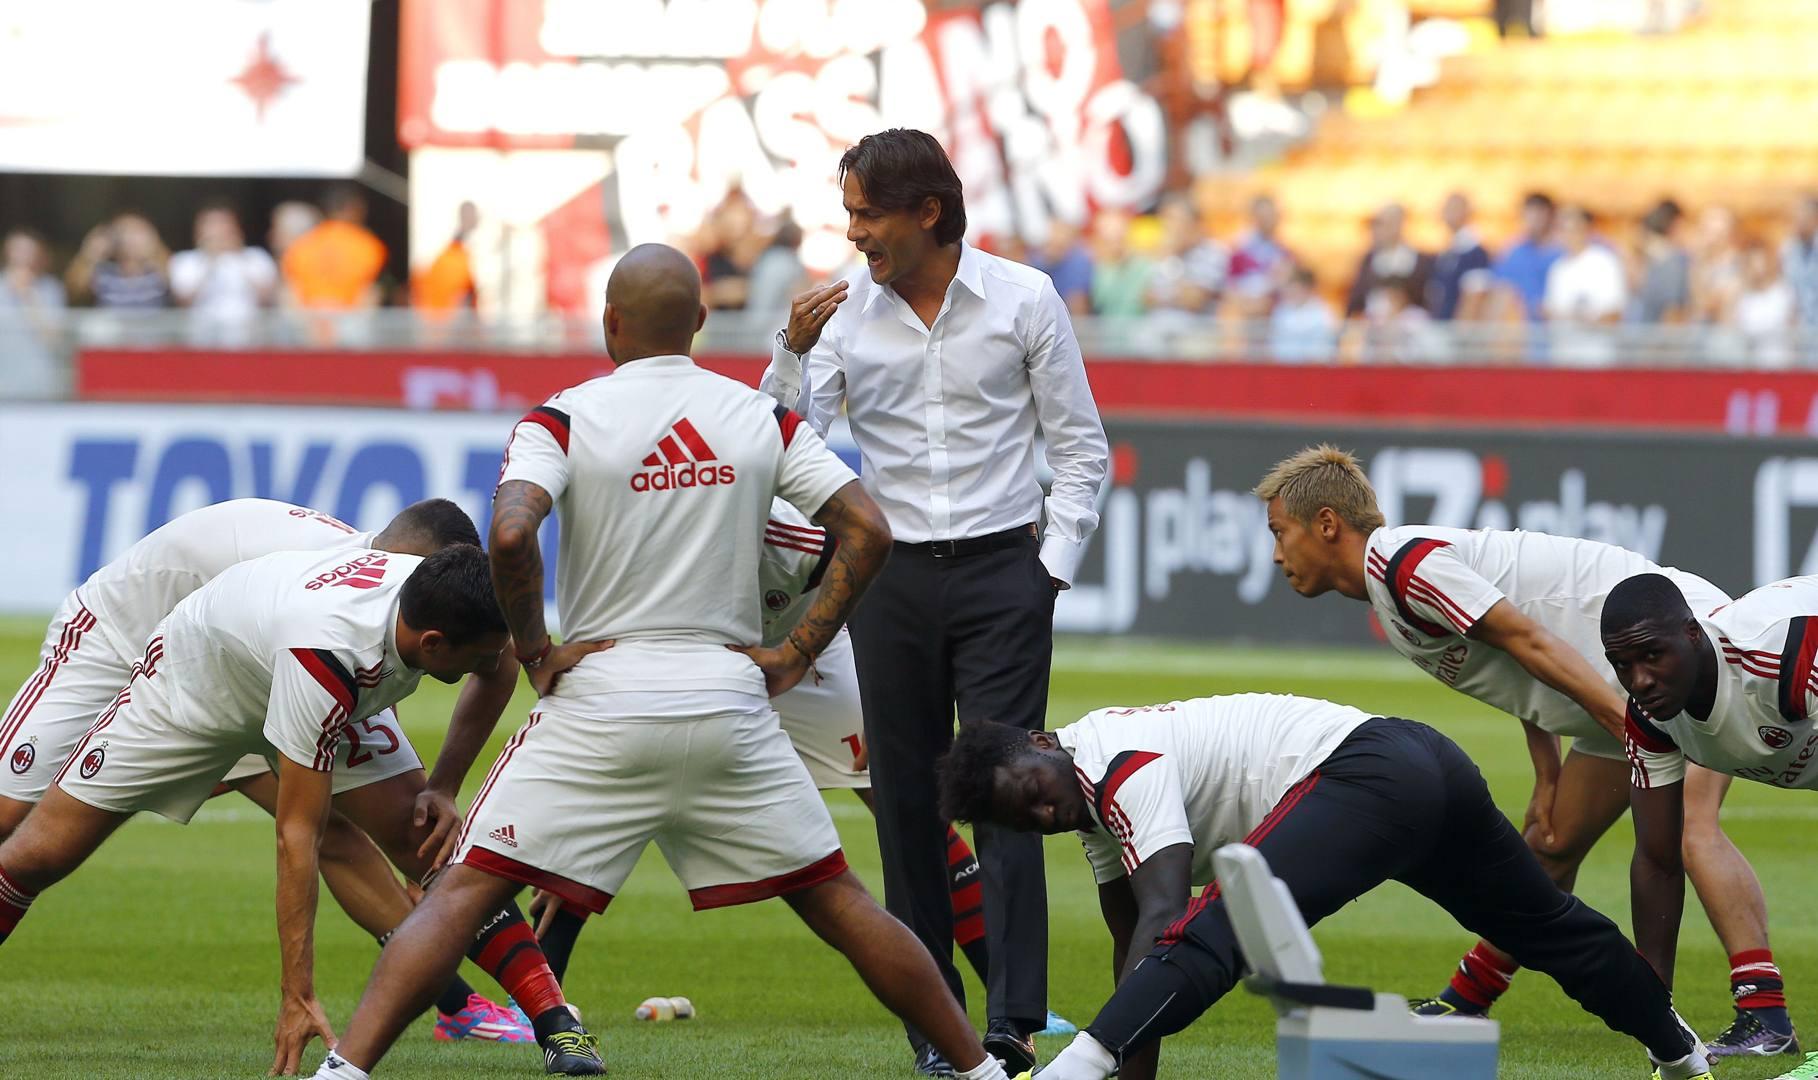 Milan: ultimi dubbi di Inzaghi, dentro Bonera dal 1 minuto